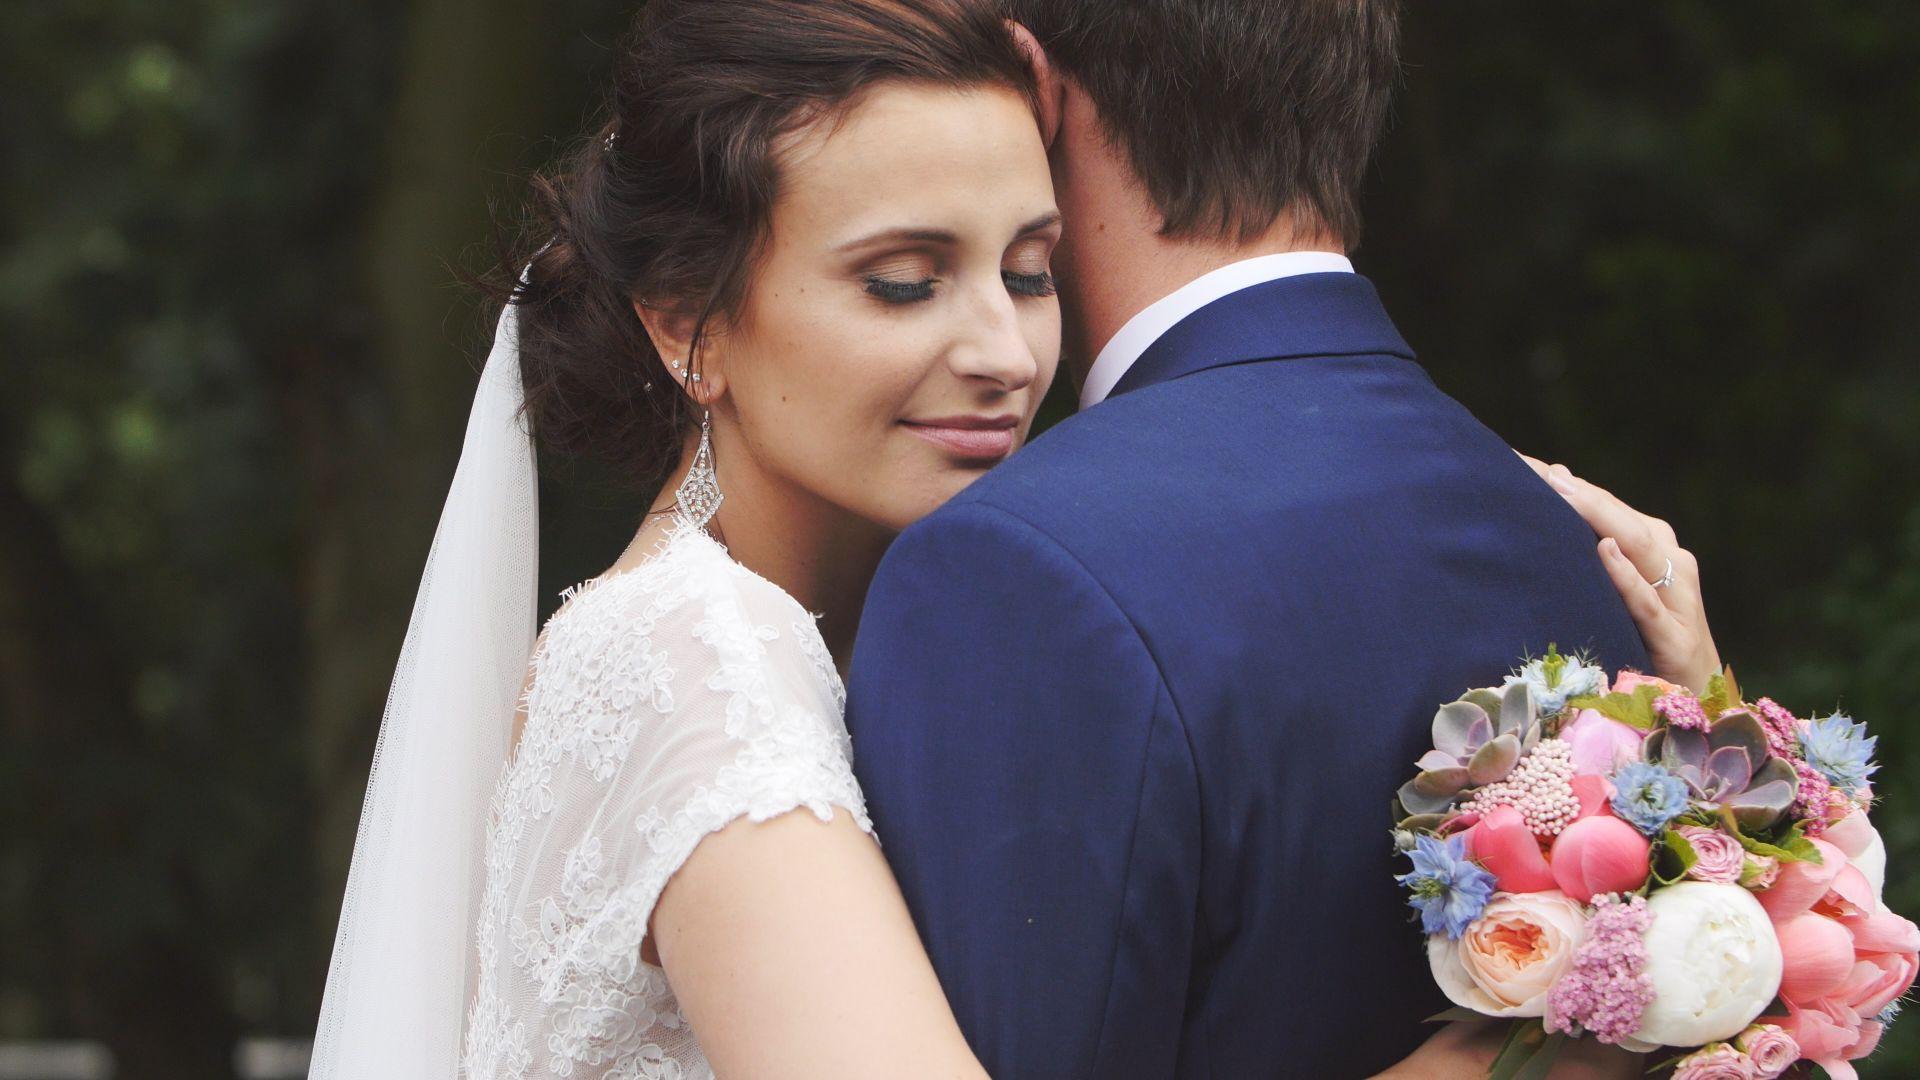 Vidéaste mariage Abbeville